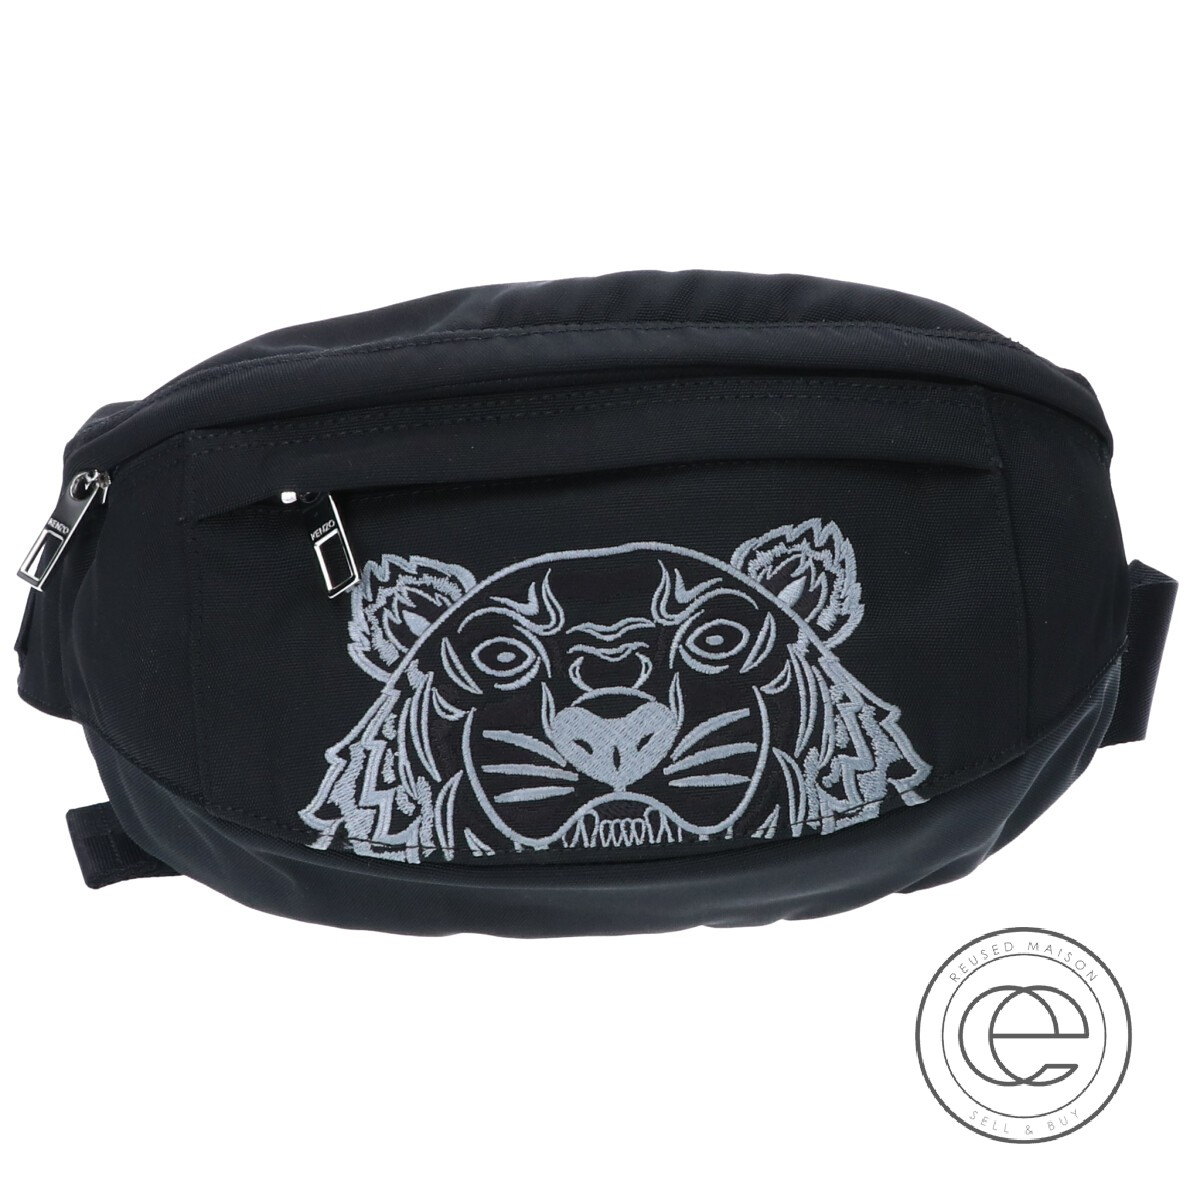 KENZO ケンゾー F965SF307F30 Tigre刺繍付ミニベルトバッグ/ ボディバッグ ブラック メンズ 【中古】